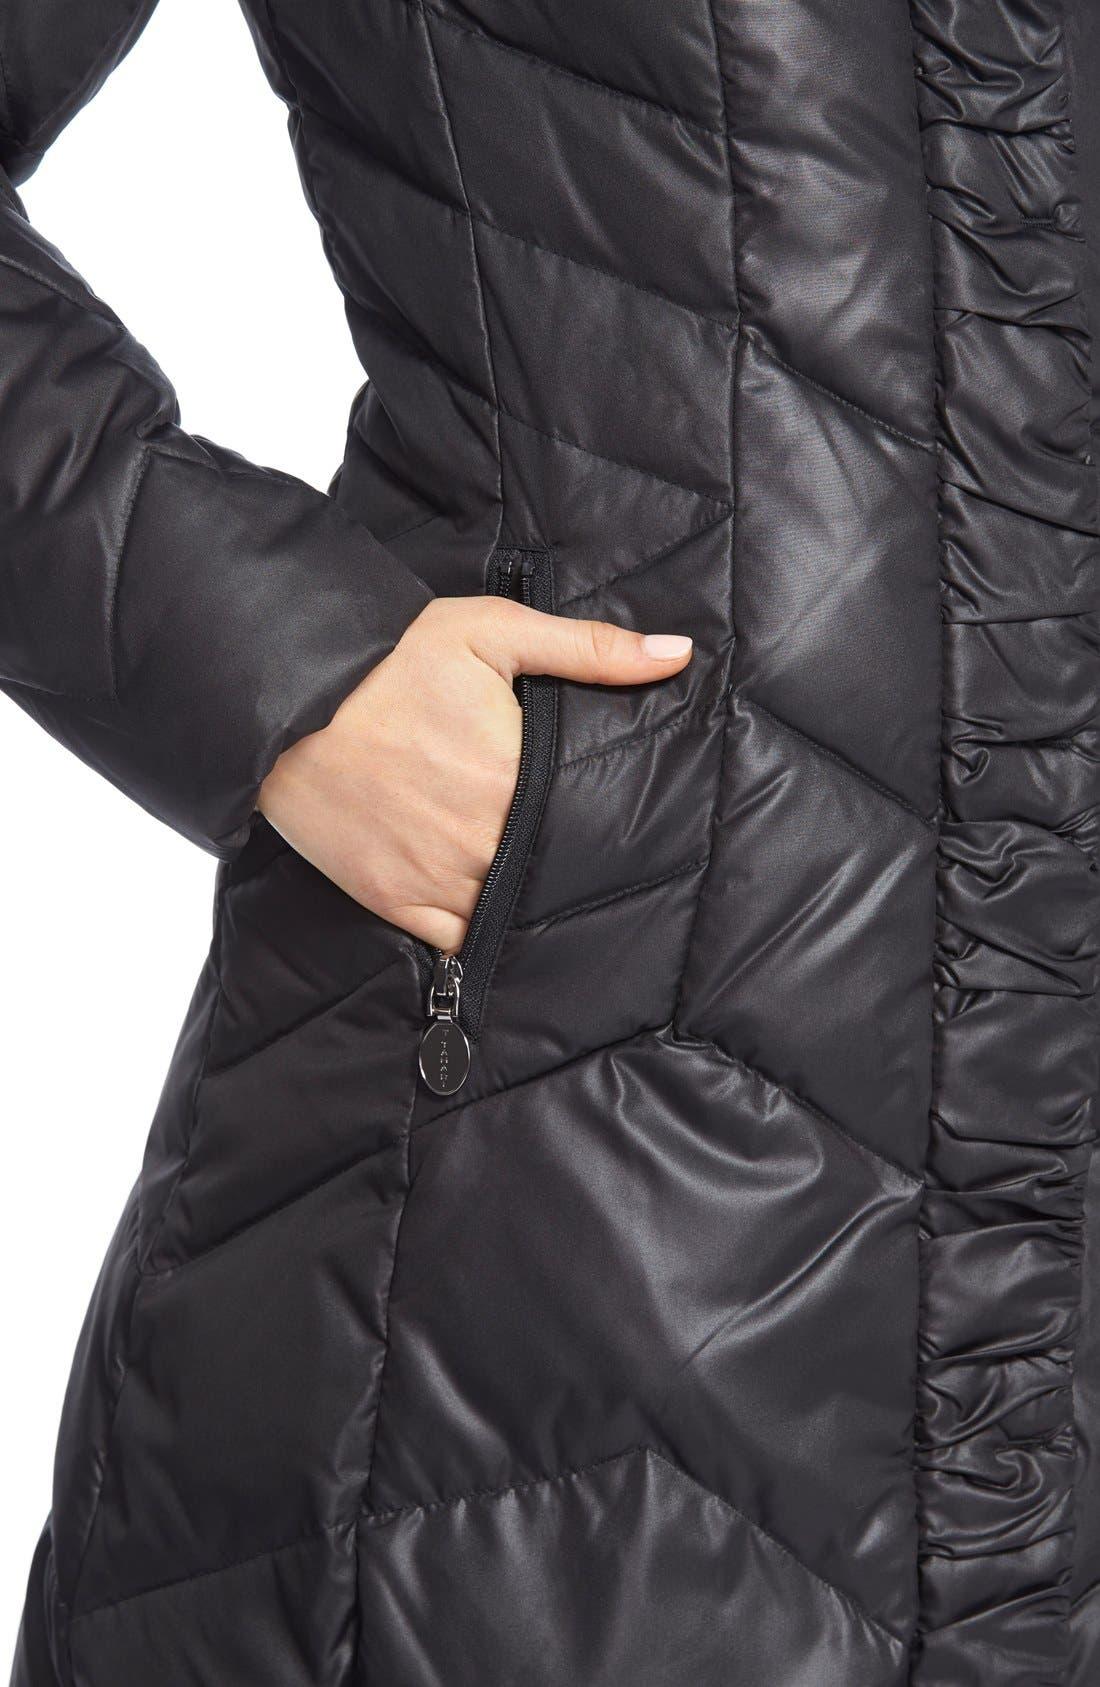 'Mia' FauxFur Trim Hooded Down Coat,                             Alternate thumbnail 4, color,                             001